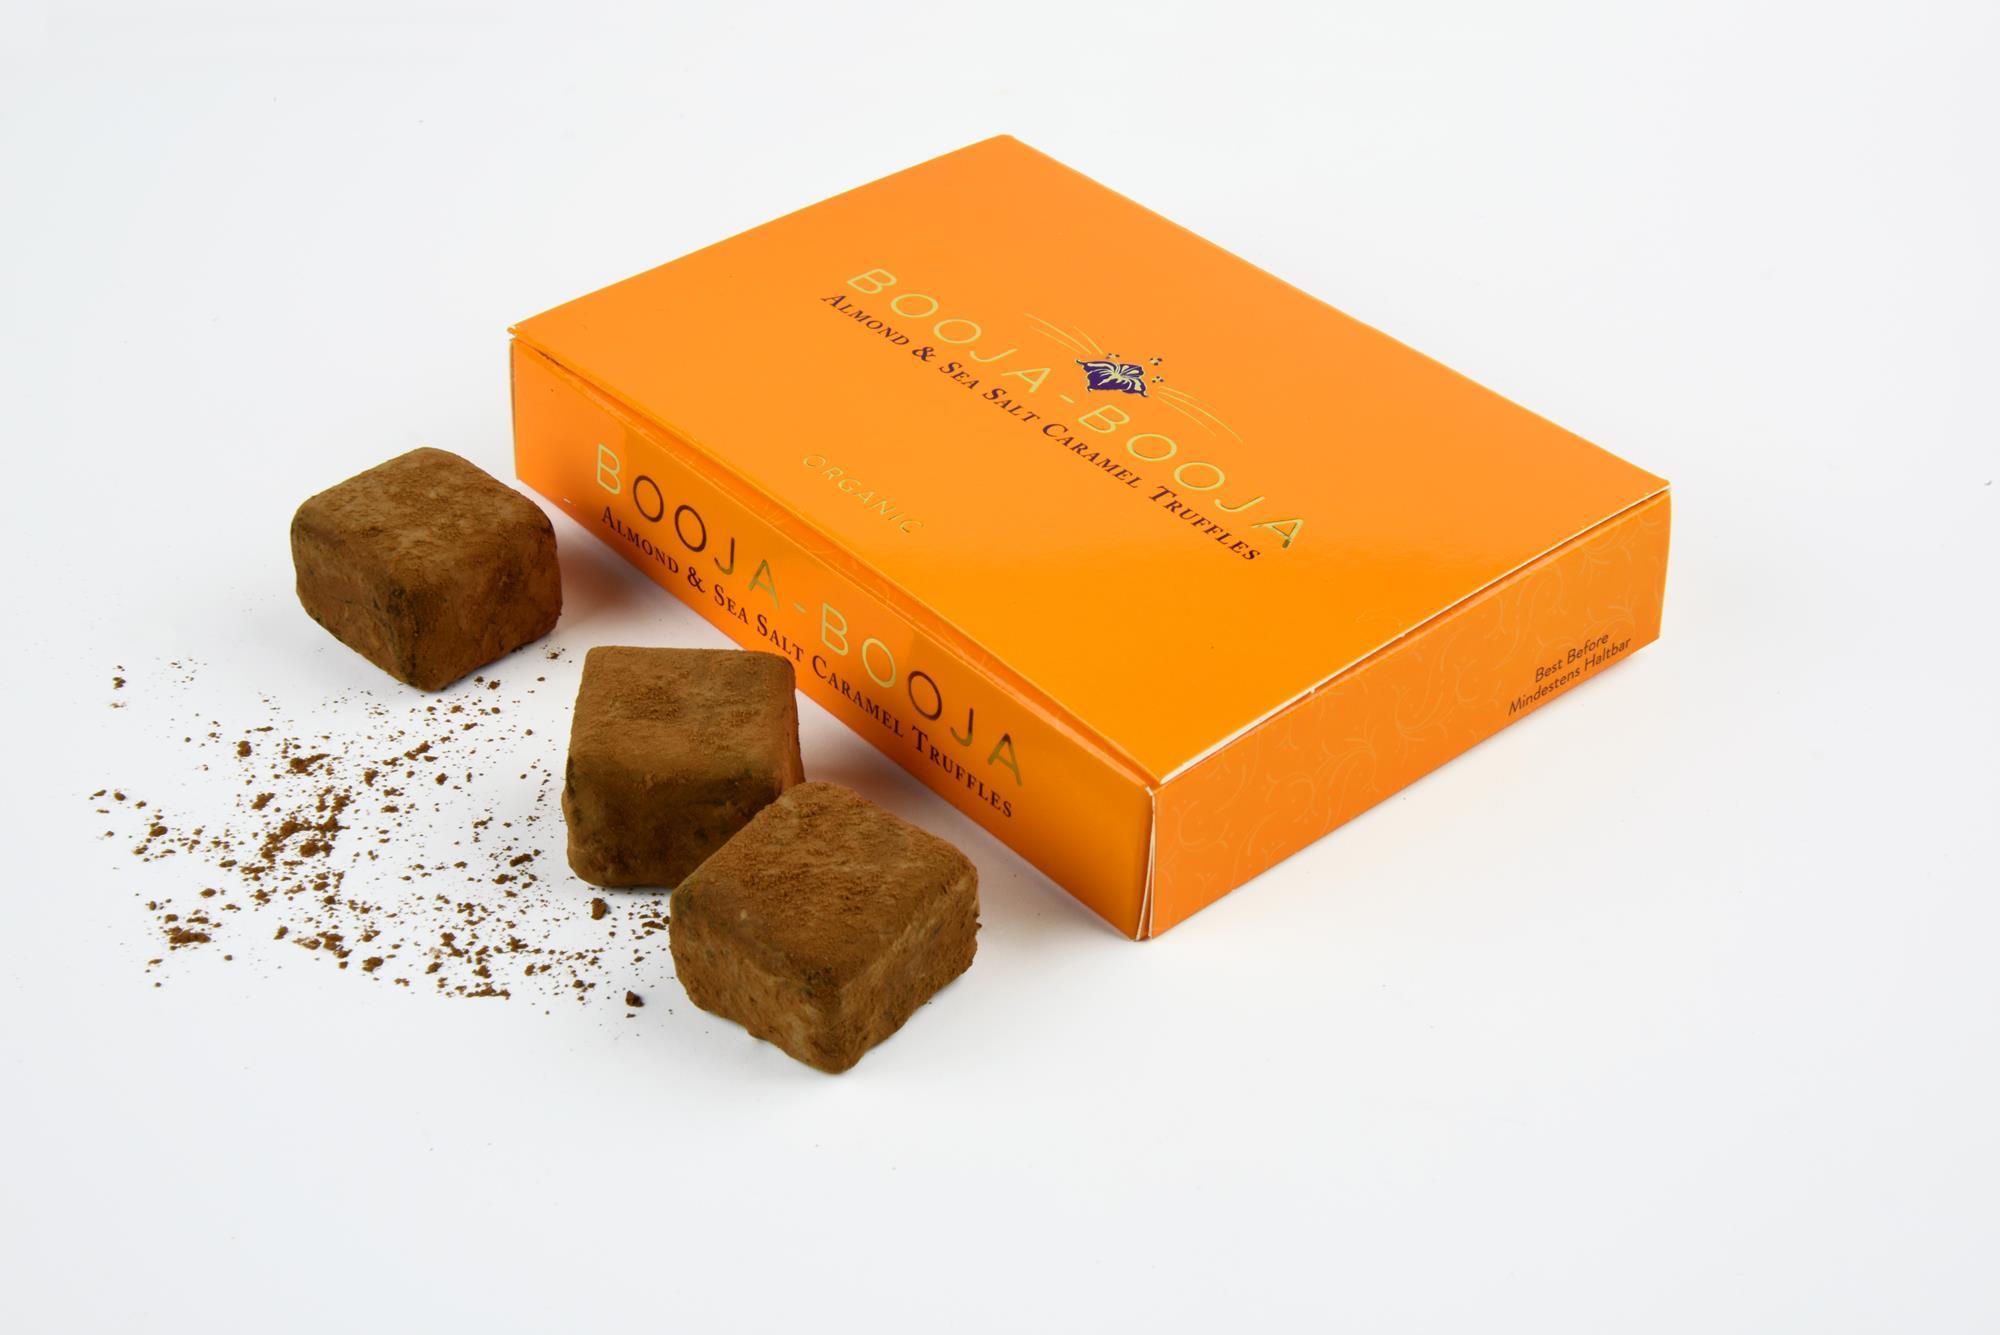 Booja Booja Unveils Chilled Chocolate Truffle Range News